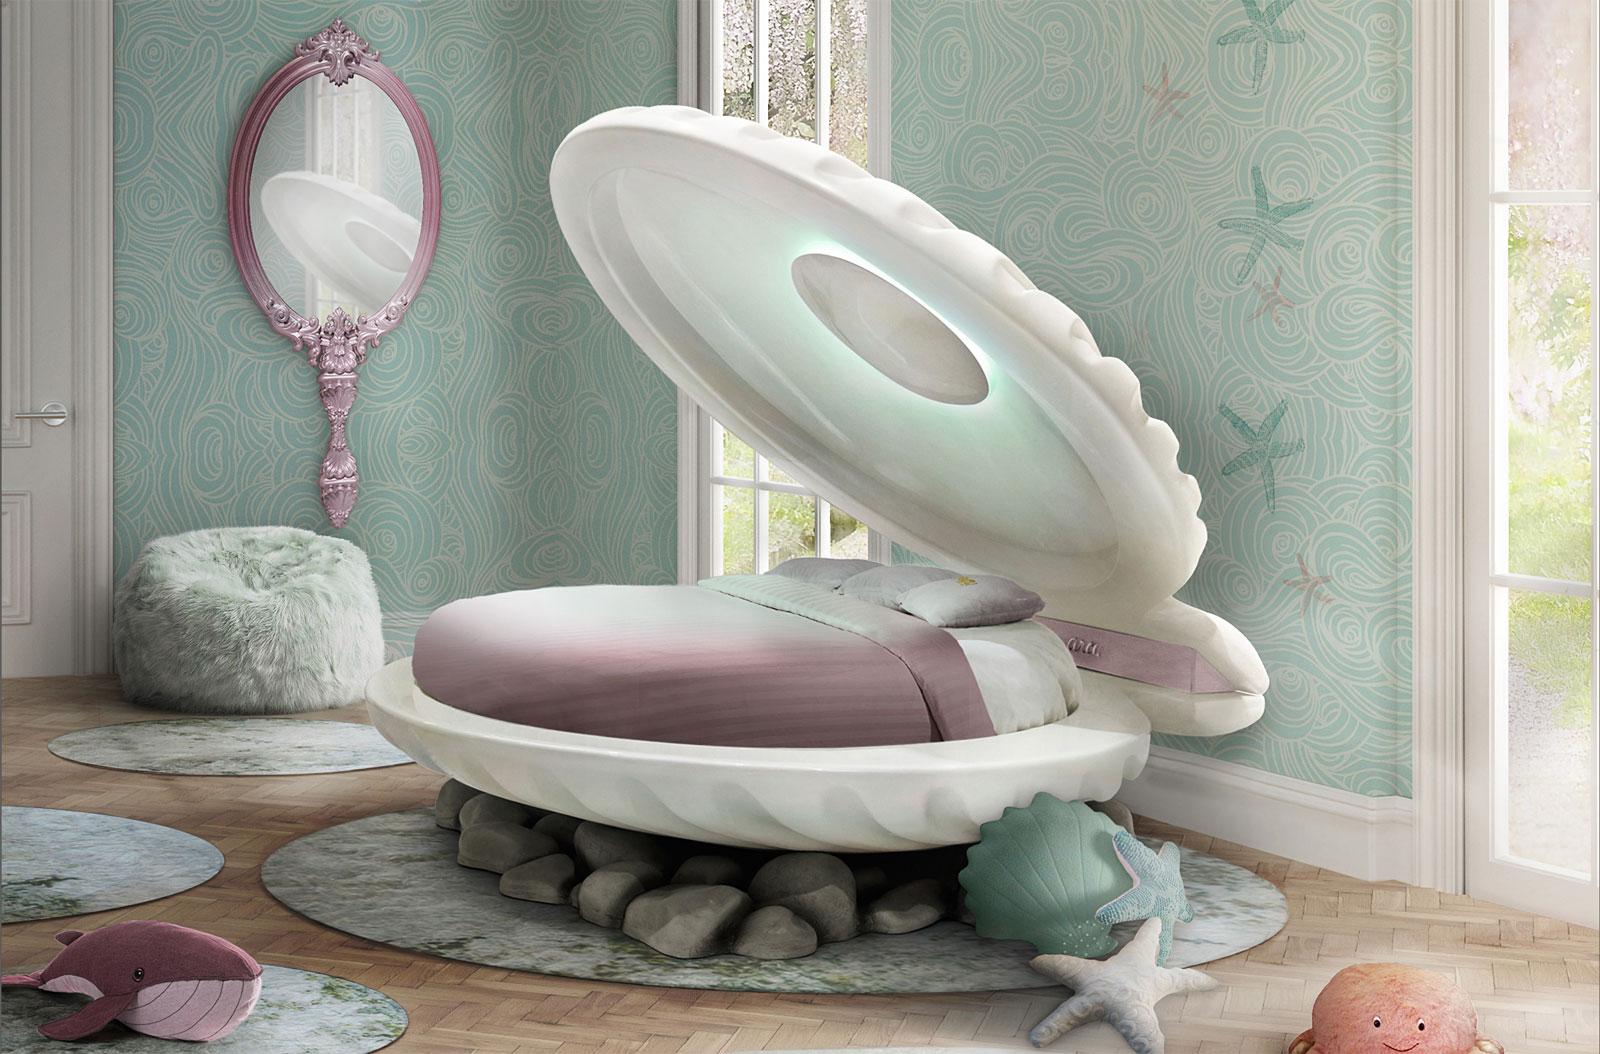 The Circu Little Mermaid Bed